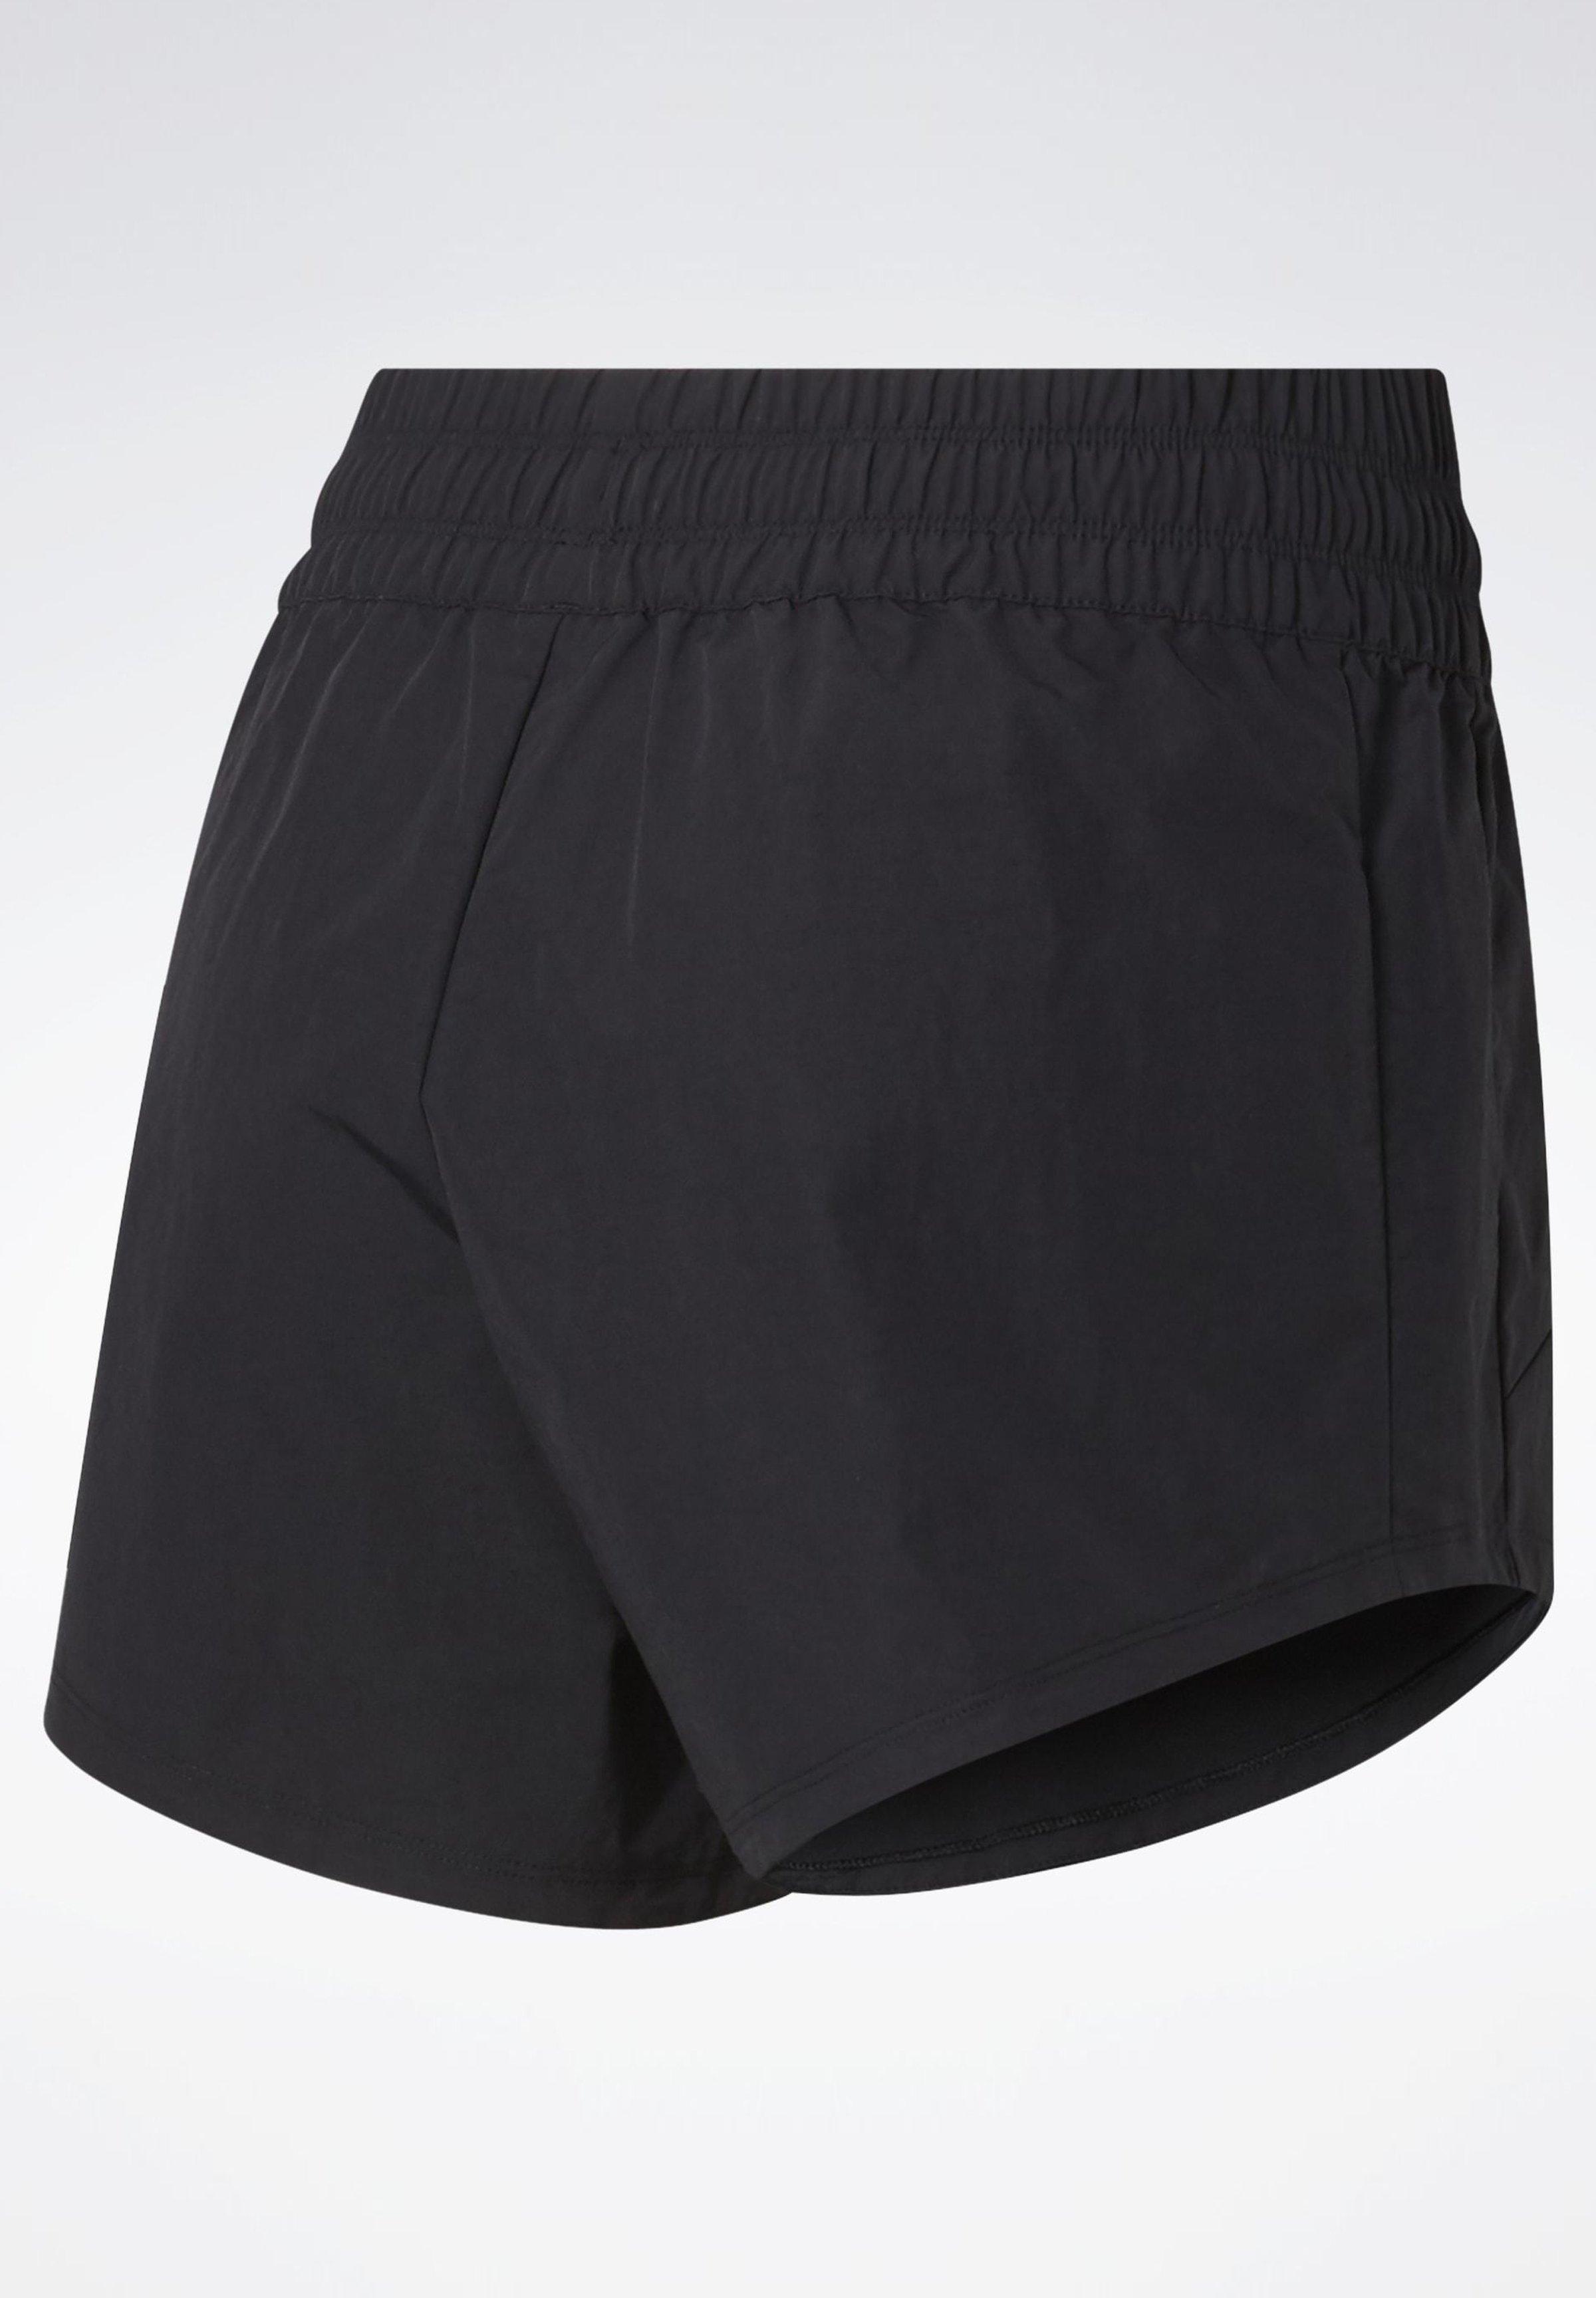 Reebok Workout Ready Shorts - Short Black